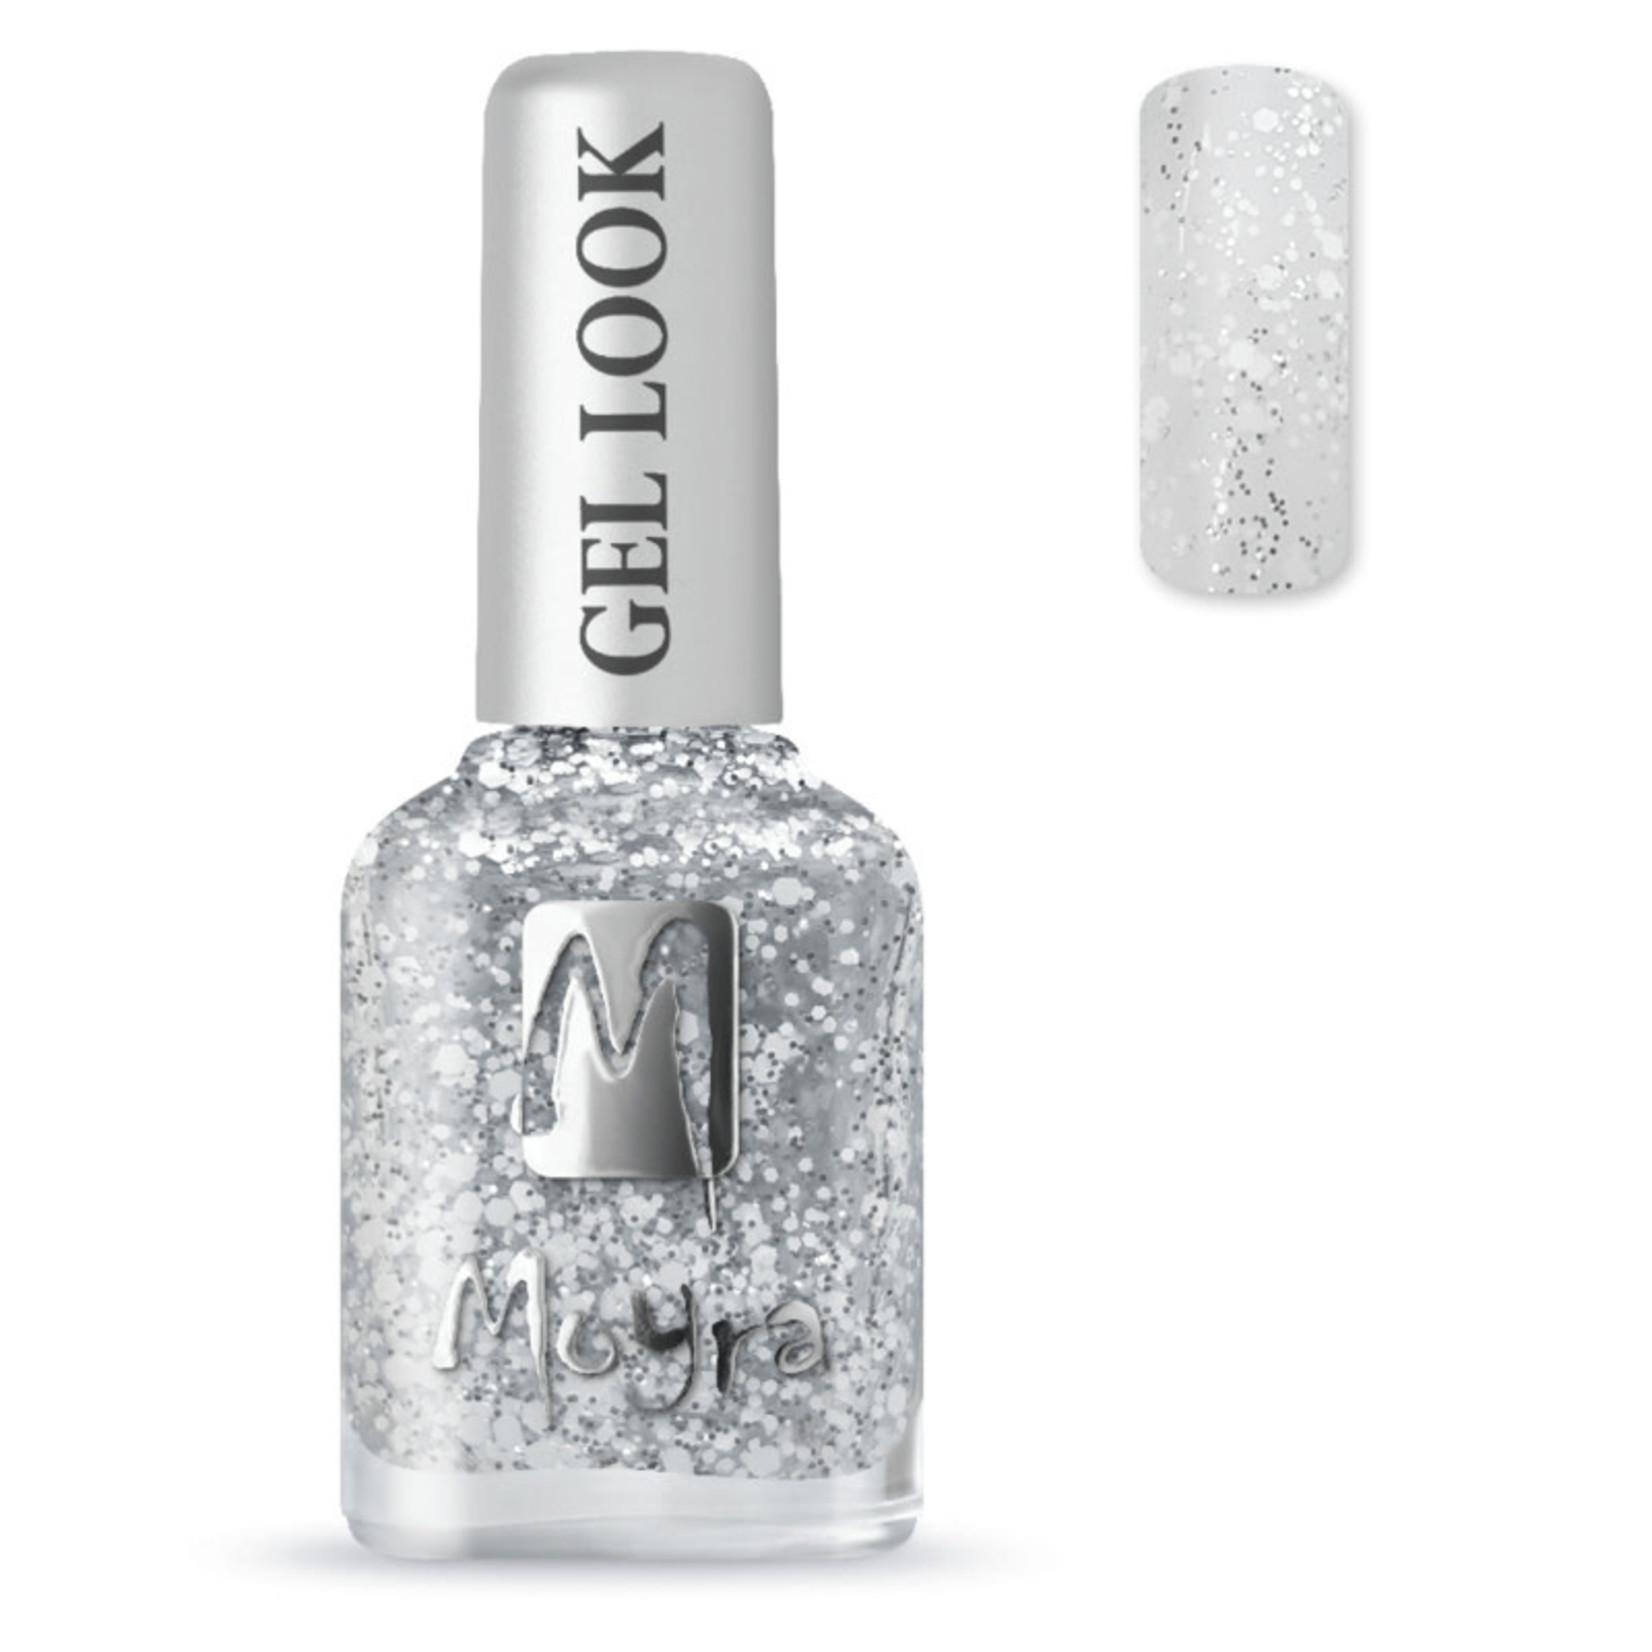 Moyra Moyra Gel Look nail polish 998 Elise